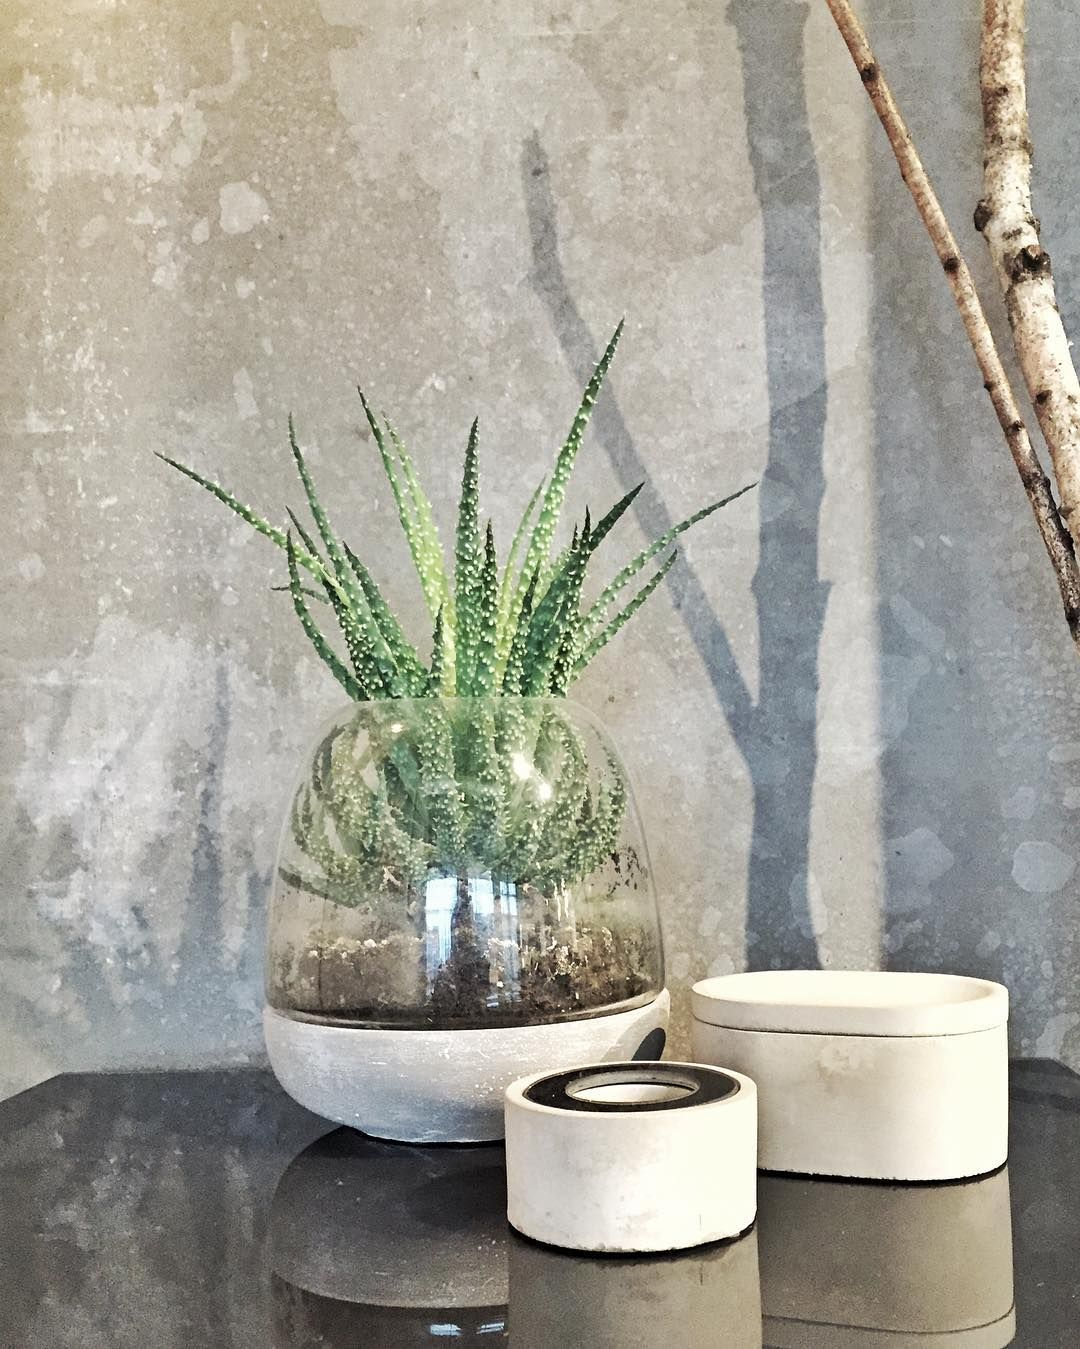 boconcept spring concrete design accessories plant flower glass interiordesign. Black Bedroom Furniture Sets. Home Design Ideas